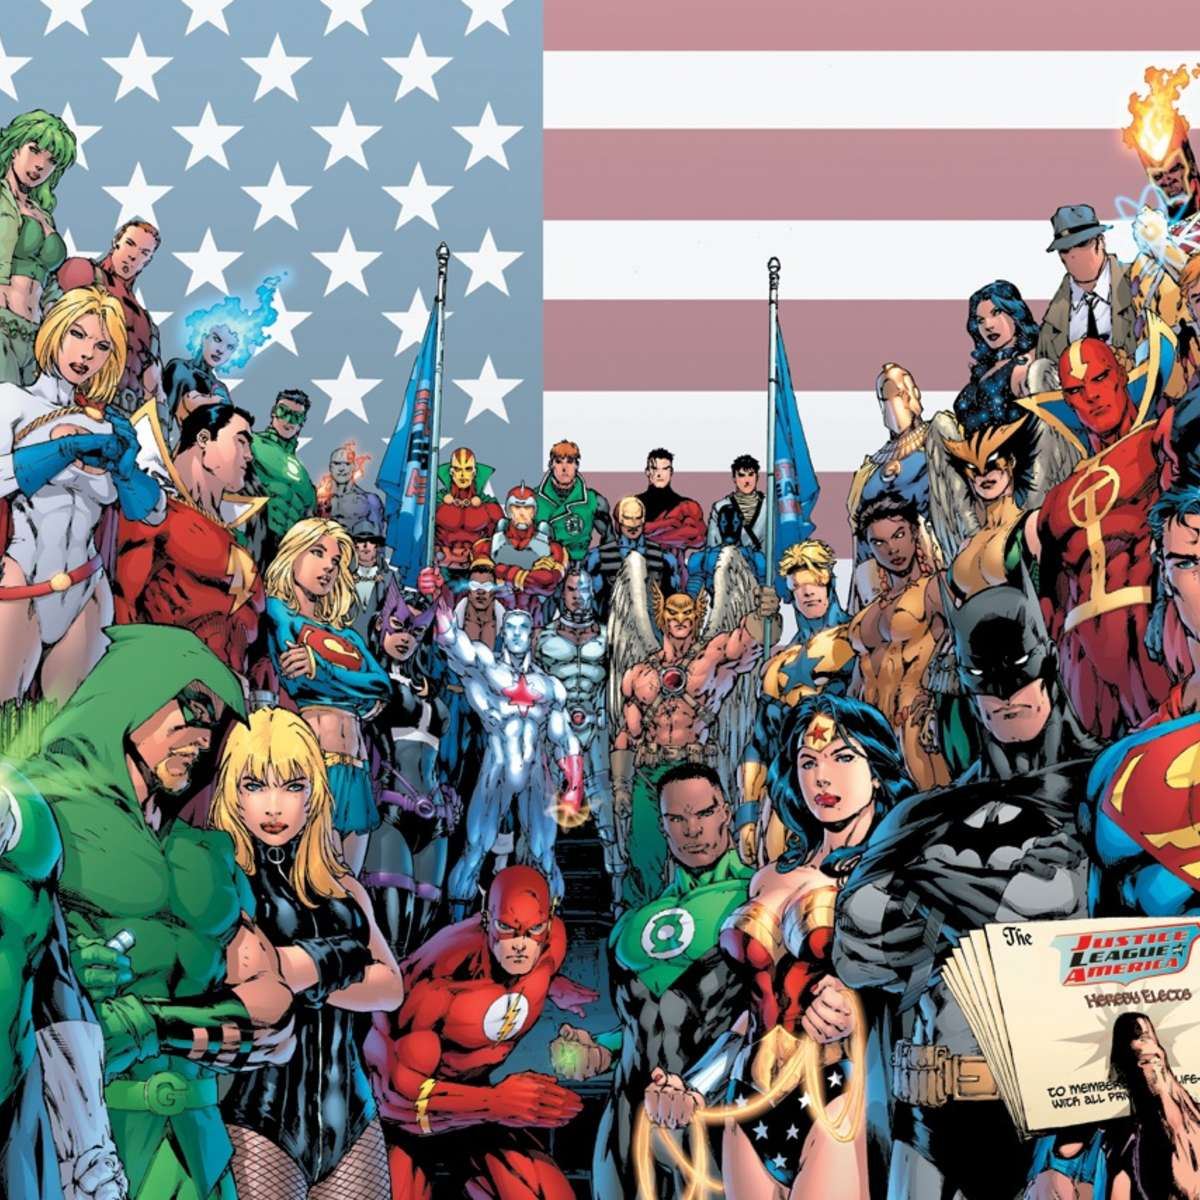 dc-comics-character-image.jpg